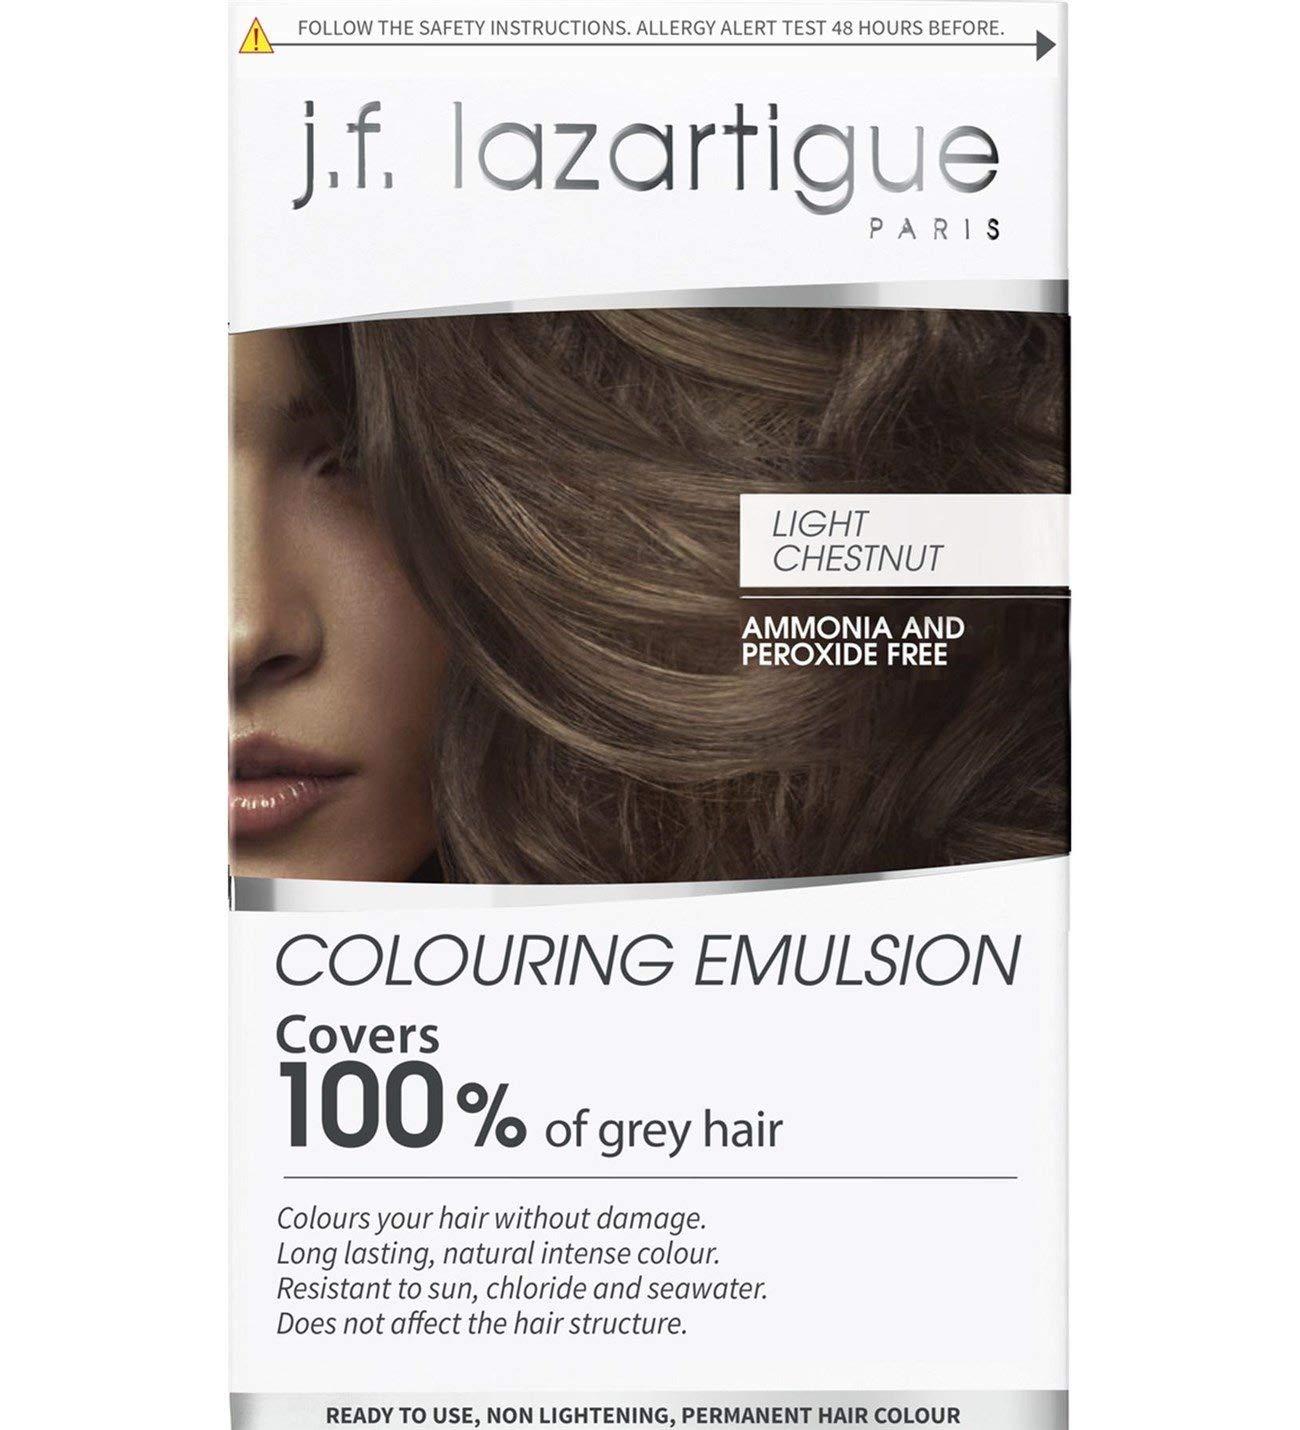 J.F. Lazartigue Color Emulsion - Light Chestnut 2.03 oz.